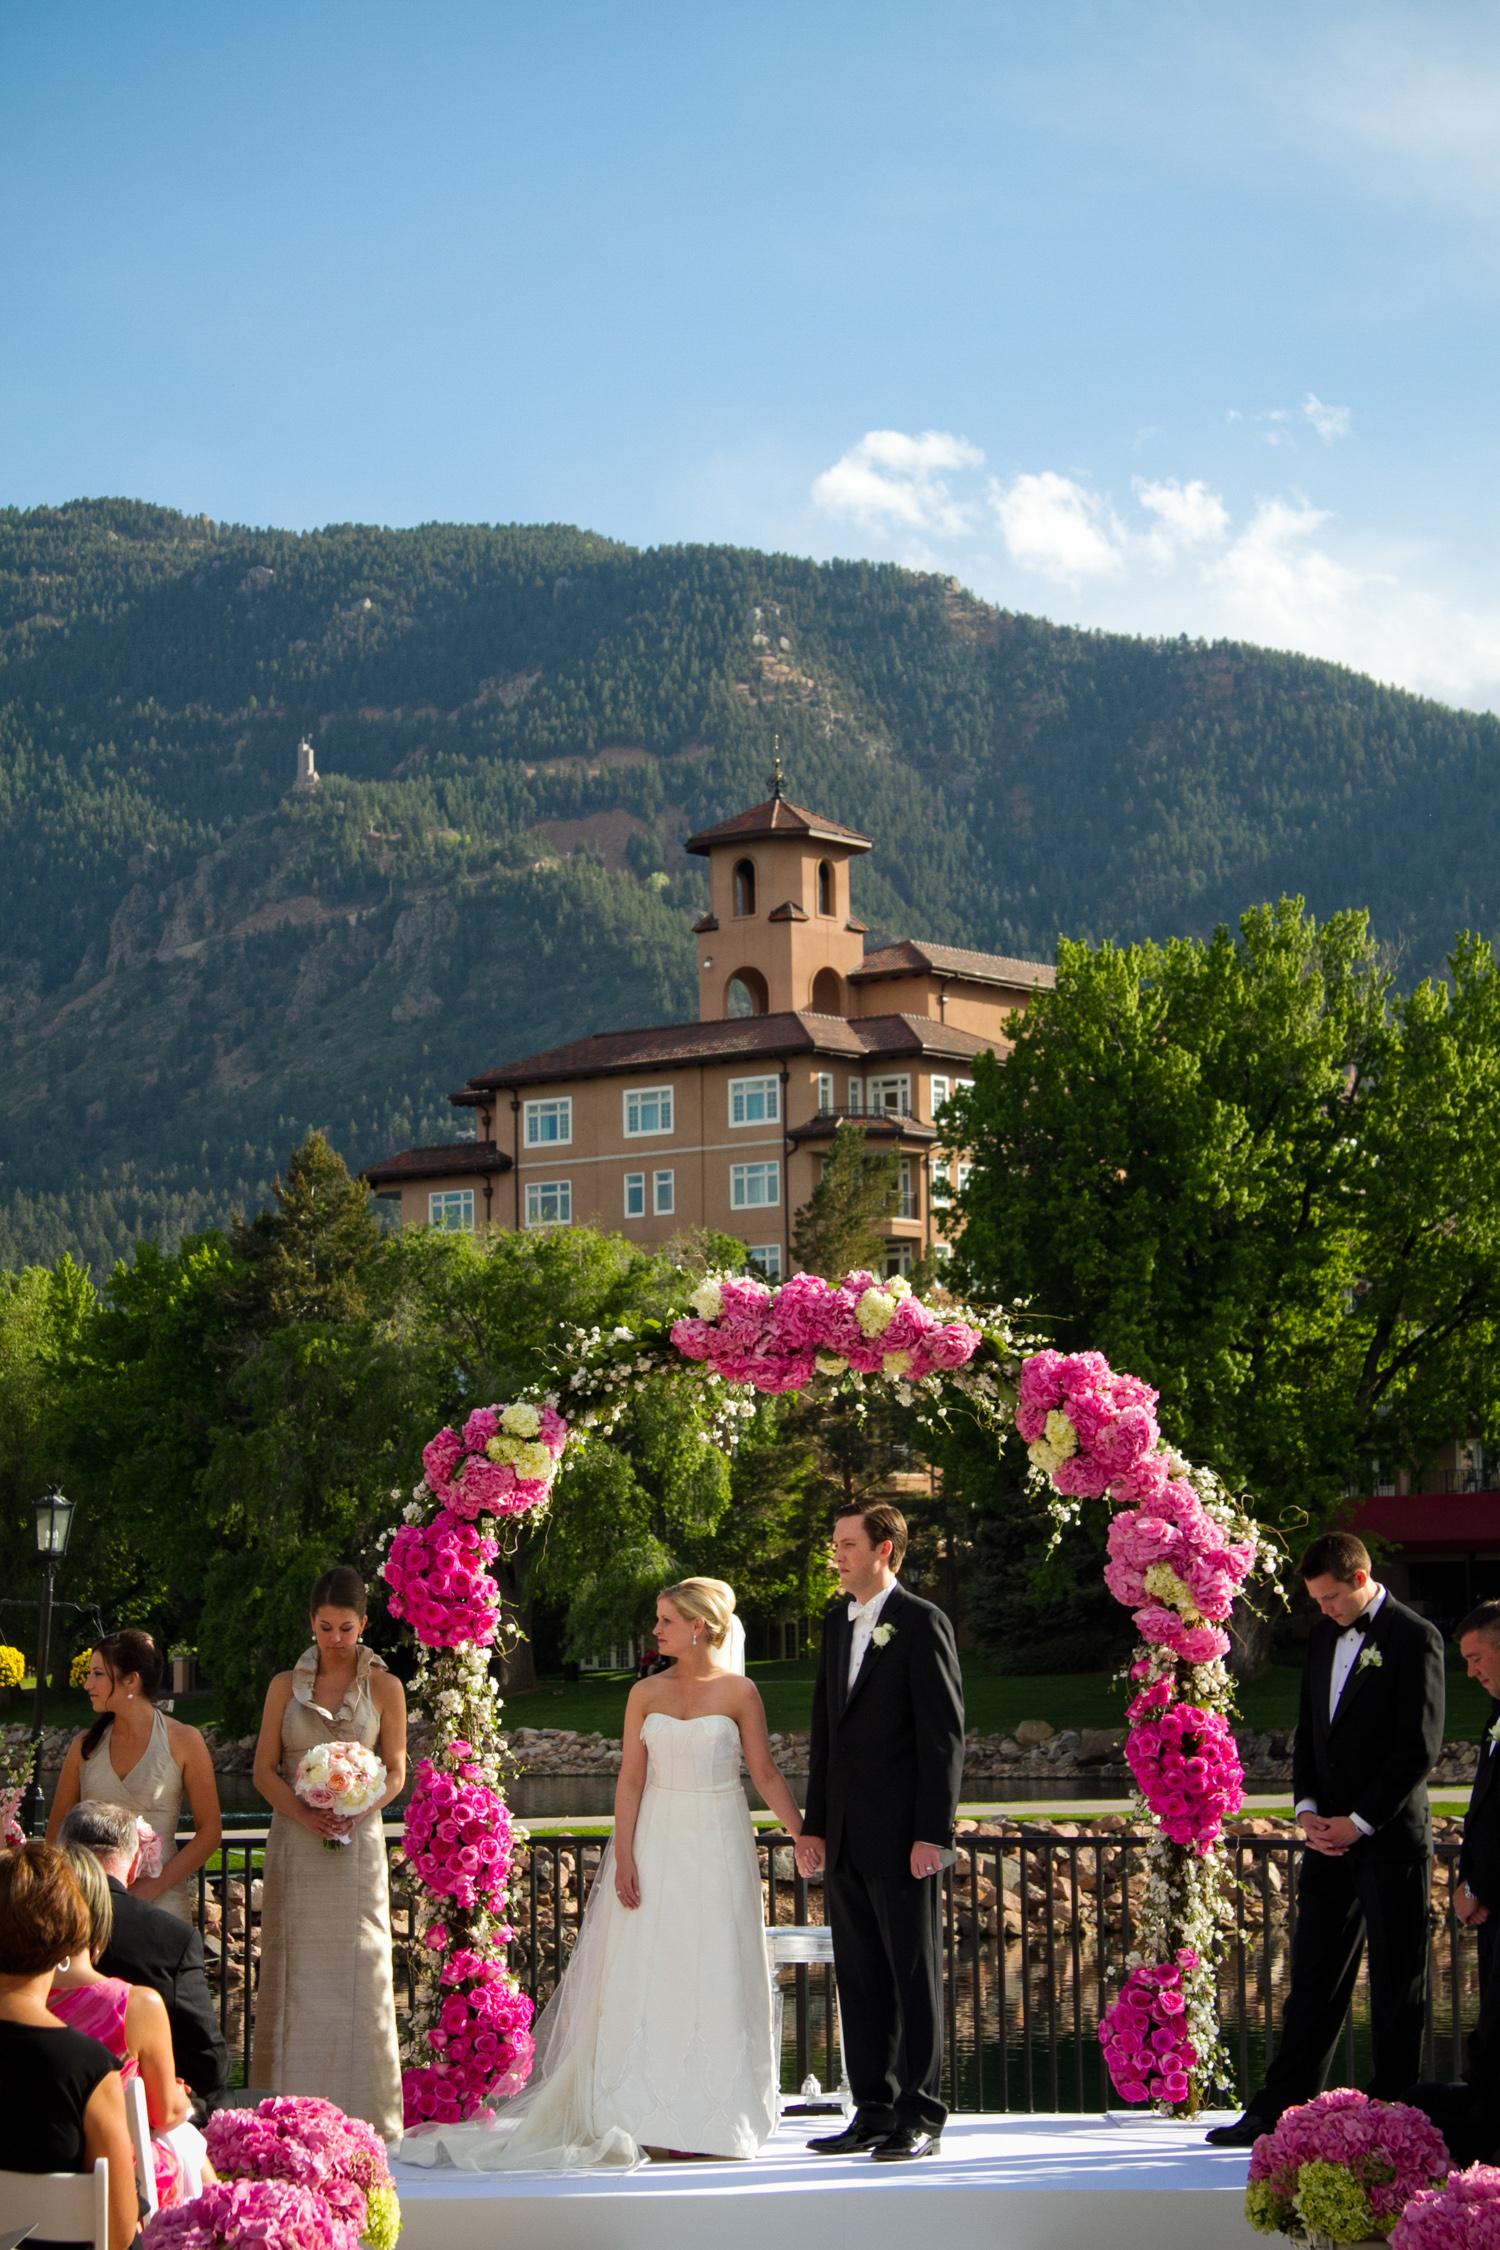 Broadmoor_Wedding_Colorado_Springs_077.JPG